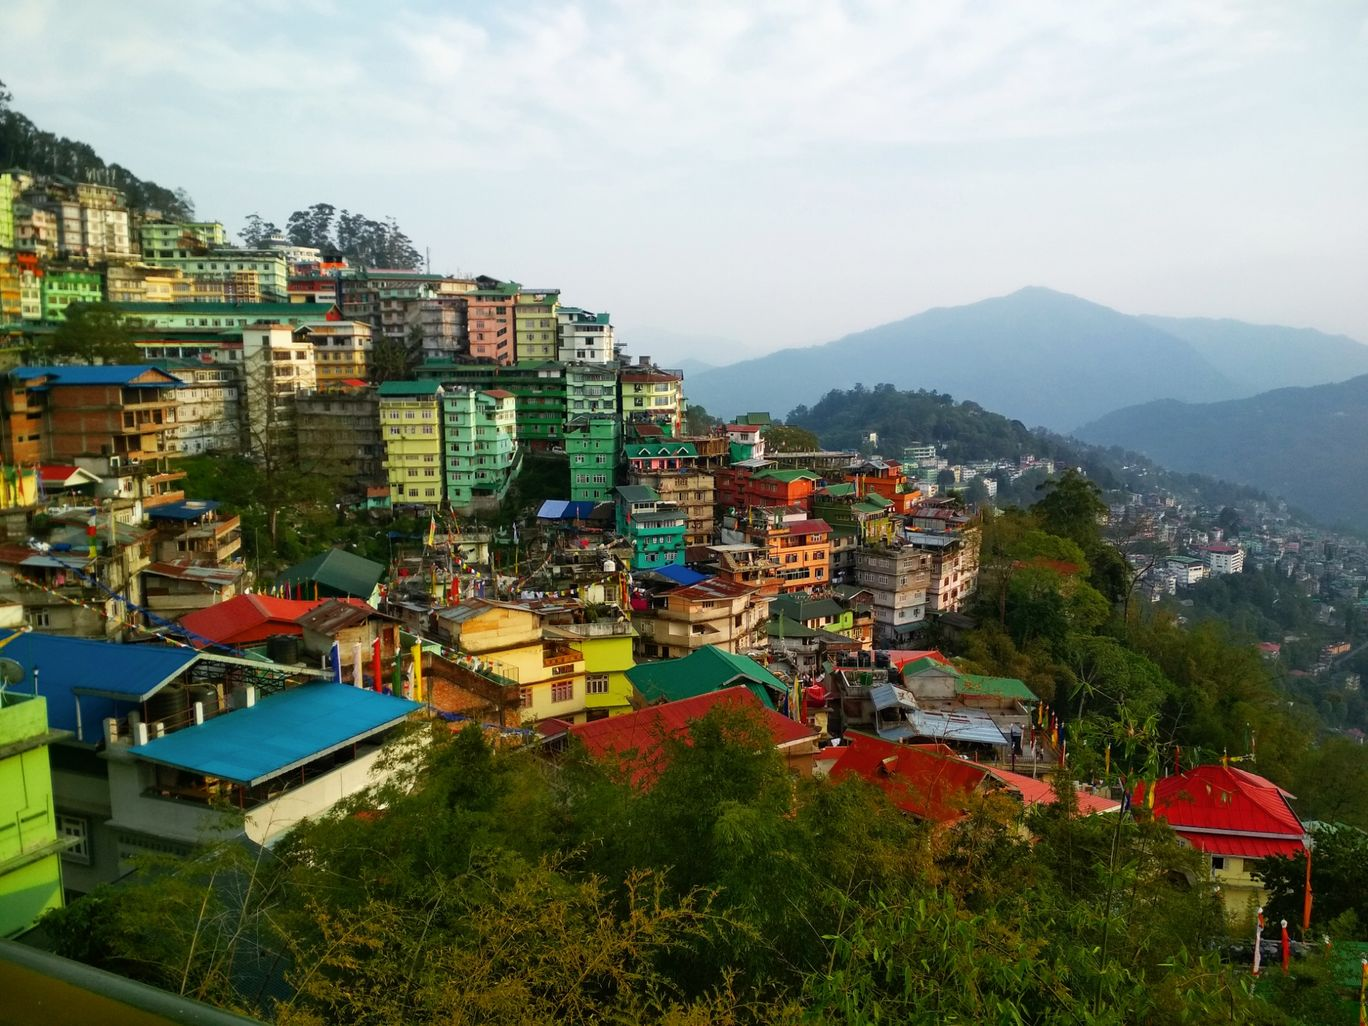 Photo of Gangtok By Urvshi Rathore